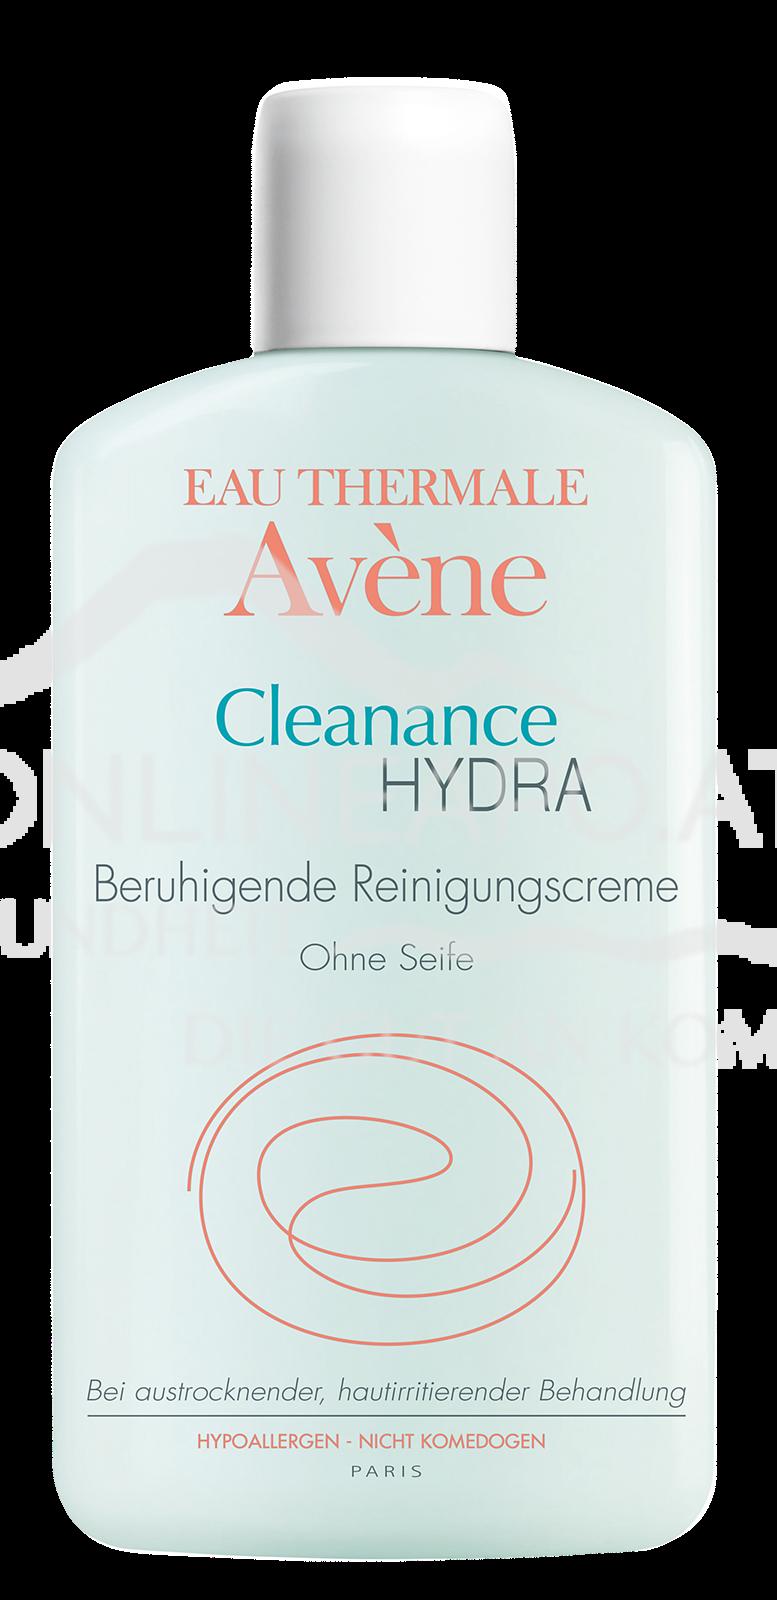 Avène Cleanance Hydra Reinigungscreme